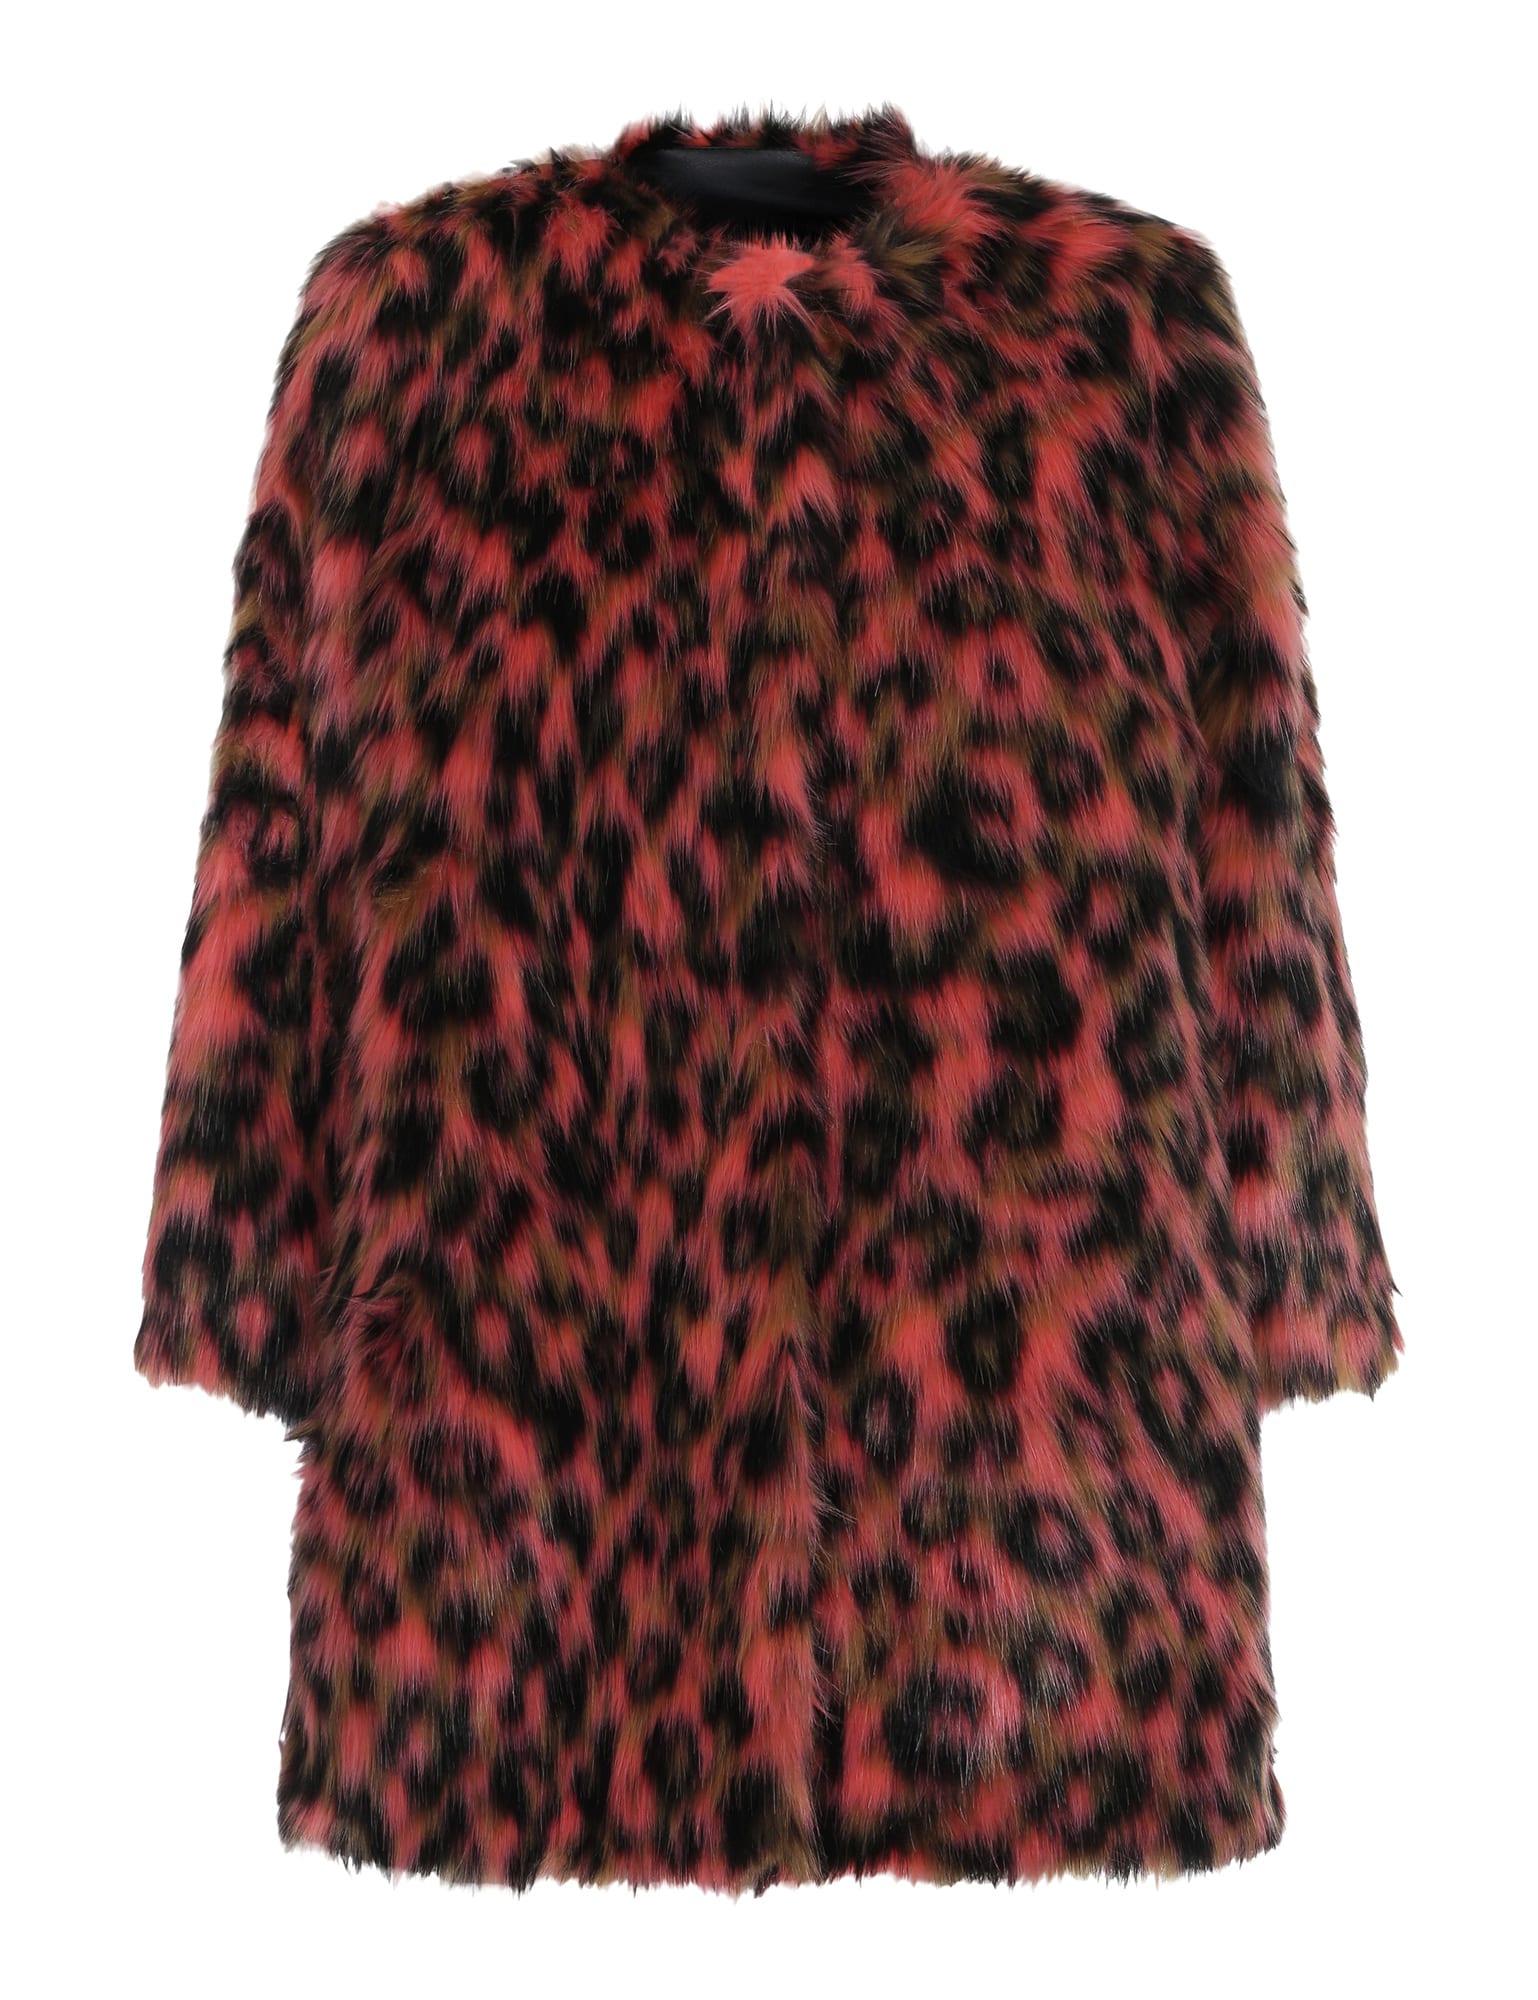 2nd Day Georgia Peach Leopard Say Faux Fur Coat